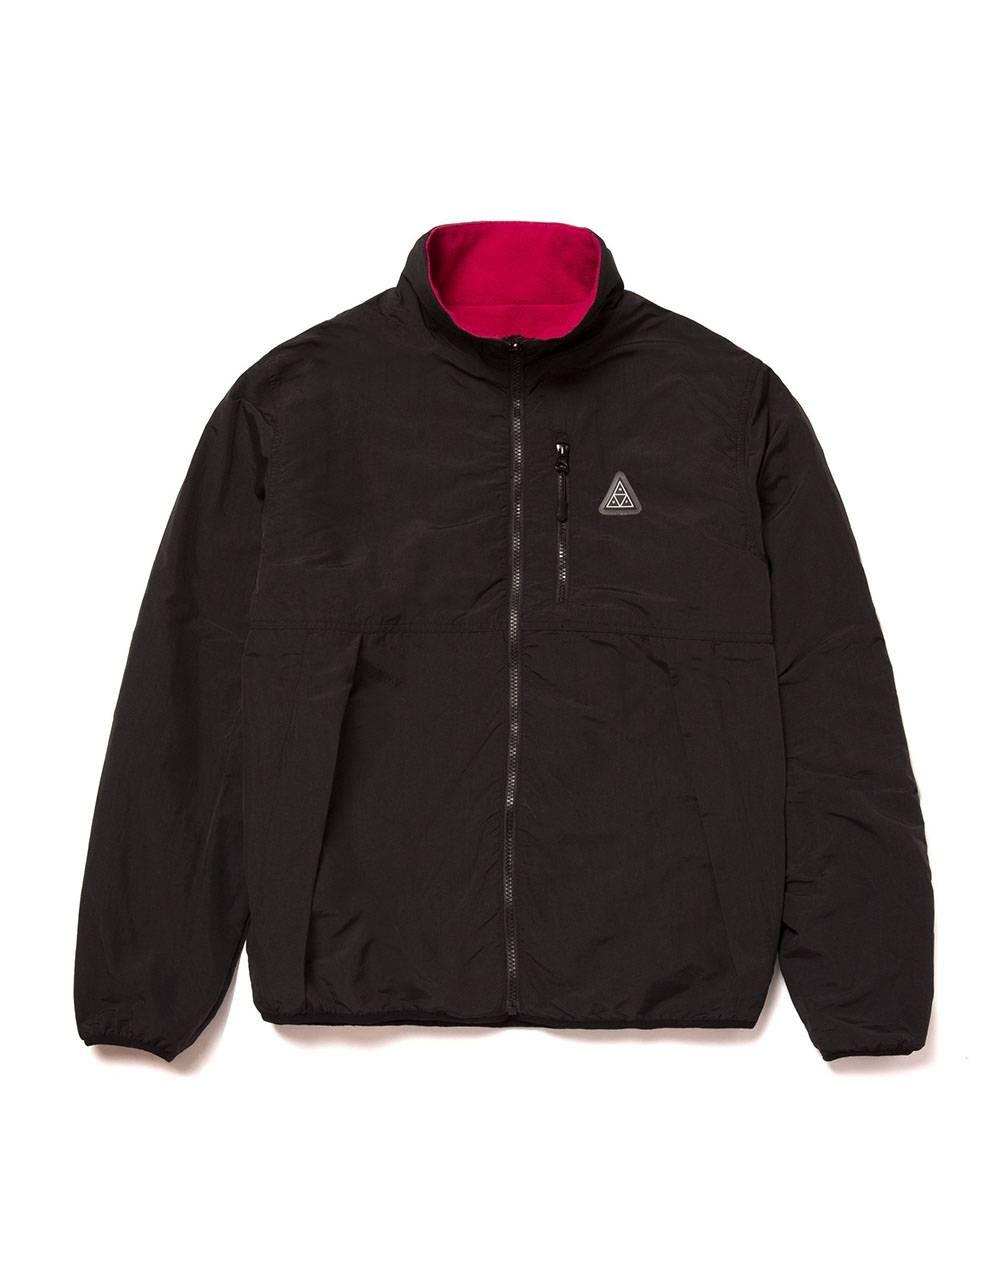 Huf Crisis reversible jacket - black Huf Jacket 209,00€